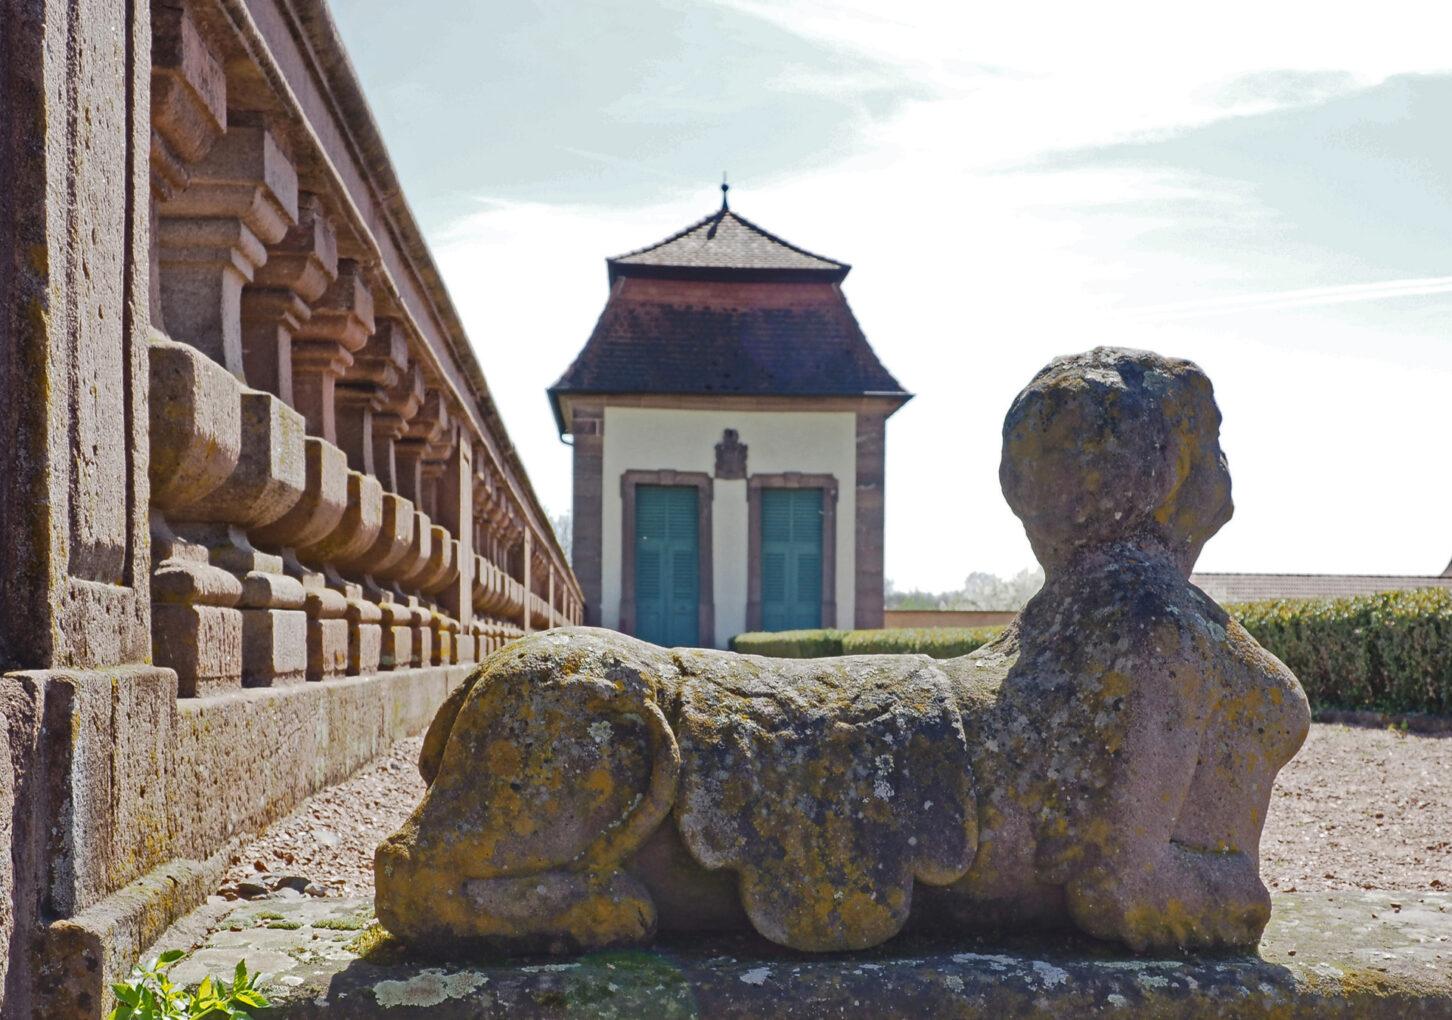 Propstei Johannesberg, Sphinx